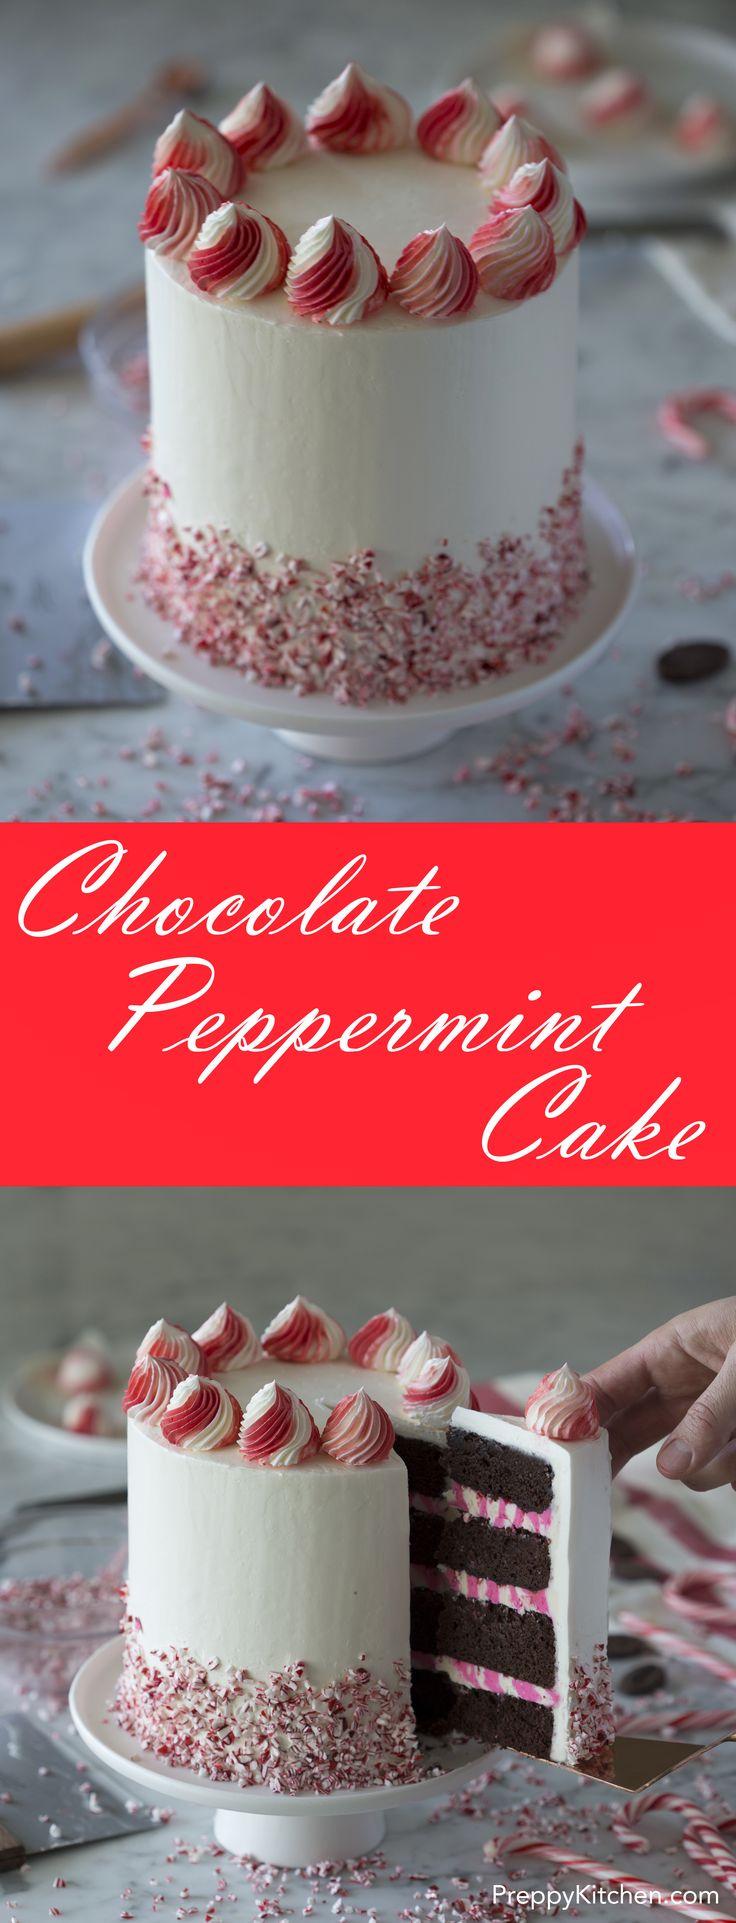 Chocolate Peppermint Cake via @preppykitchen